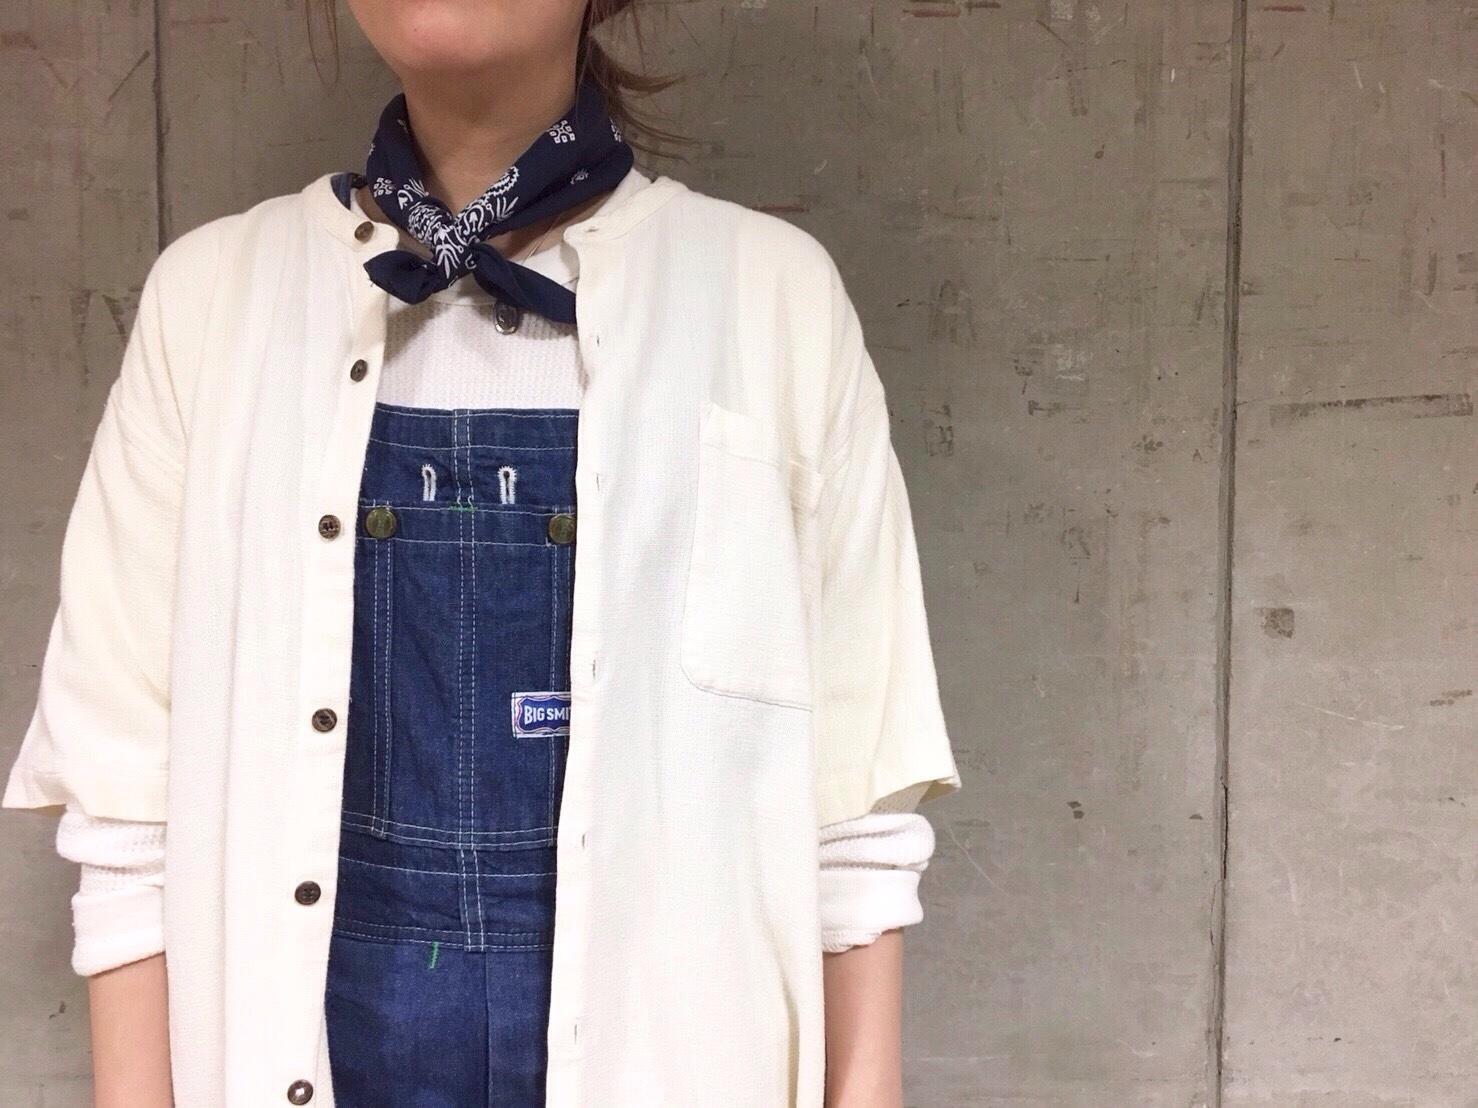 fc2blog_201704201556089c9.jpg